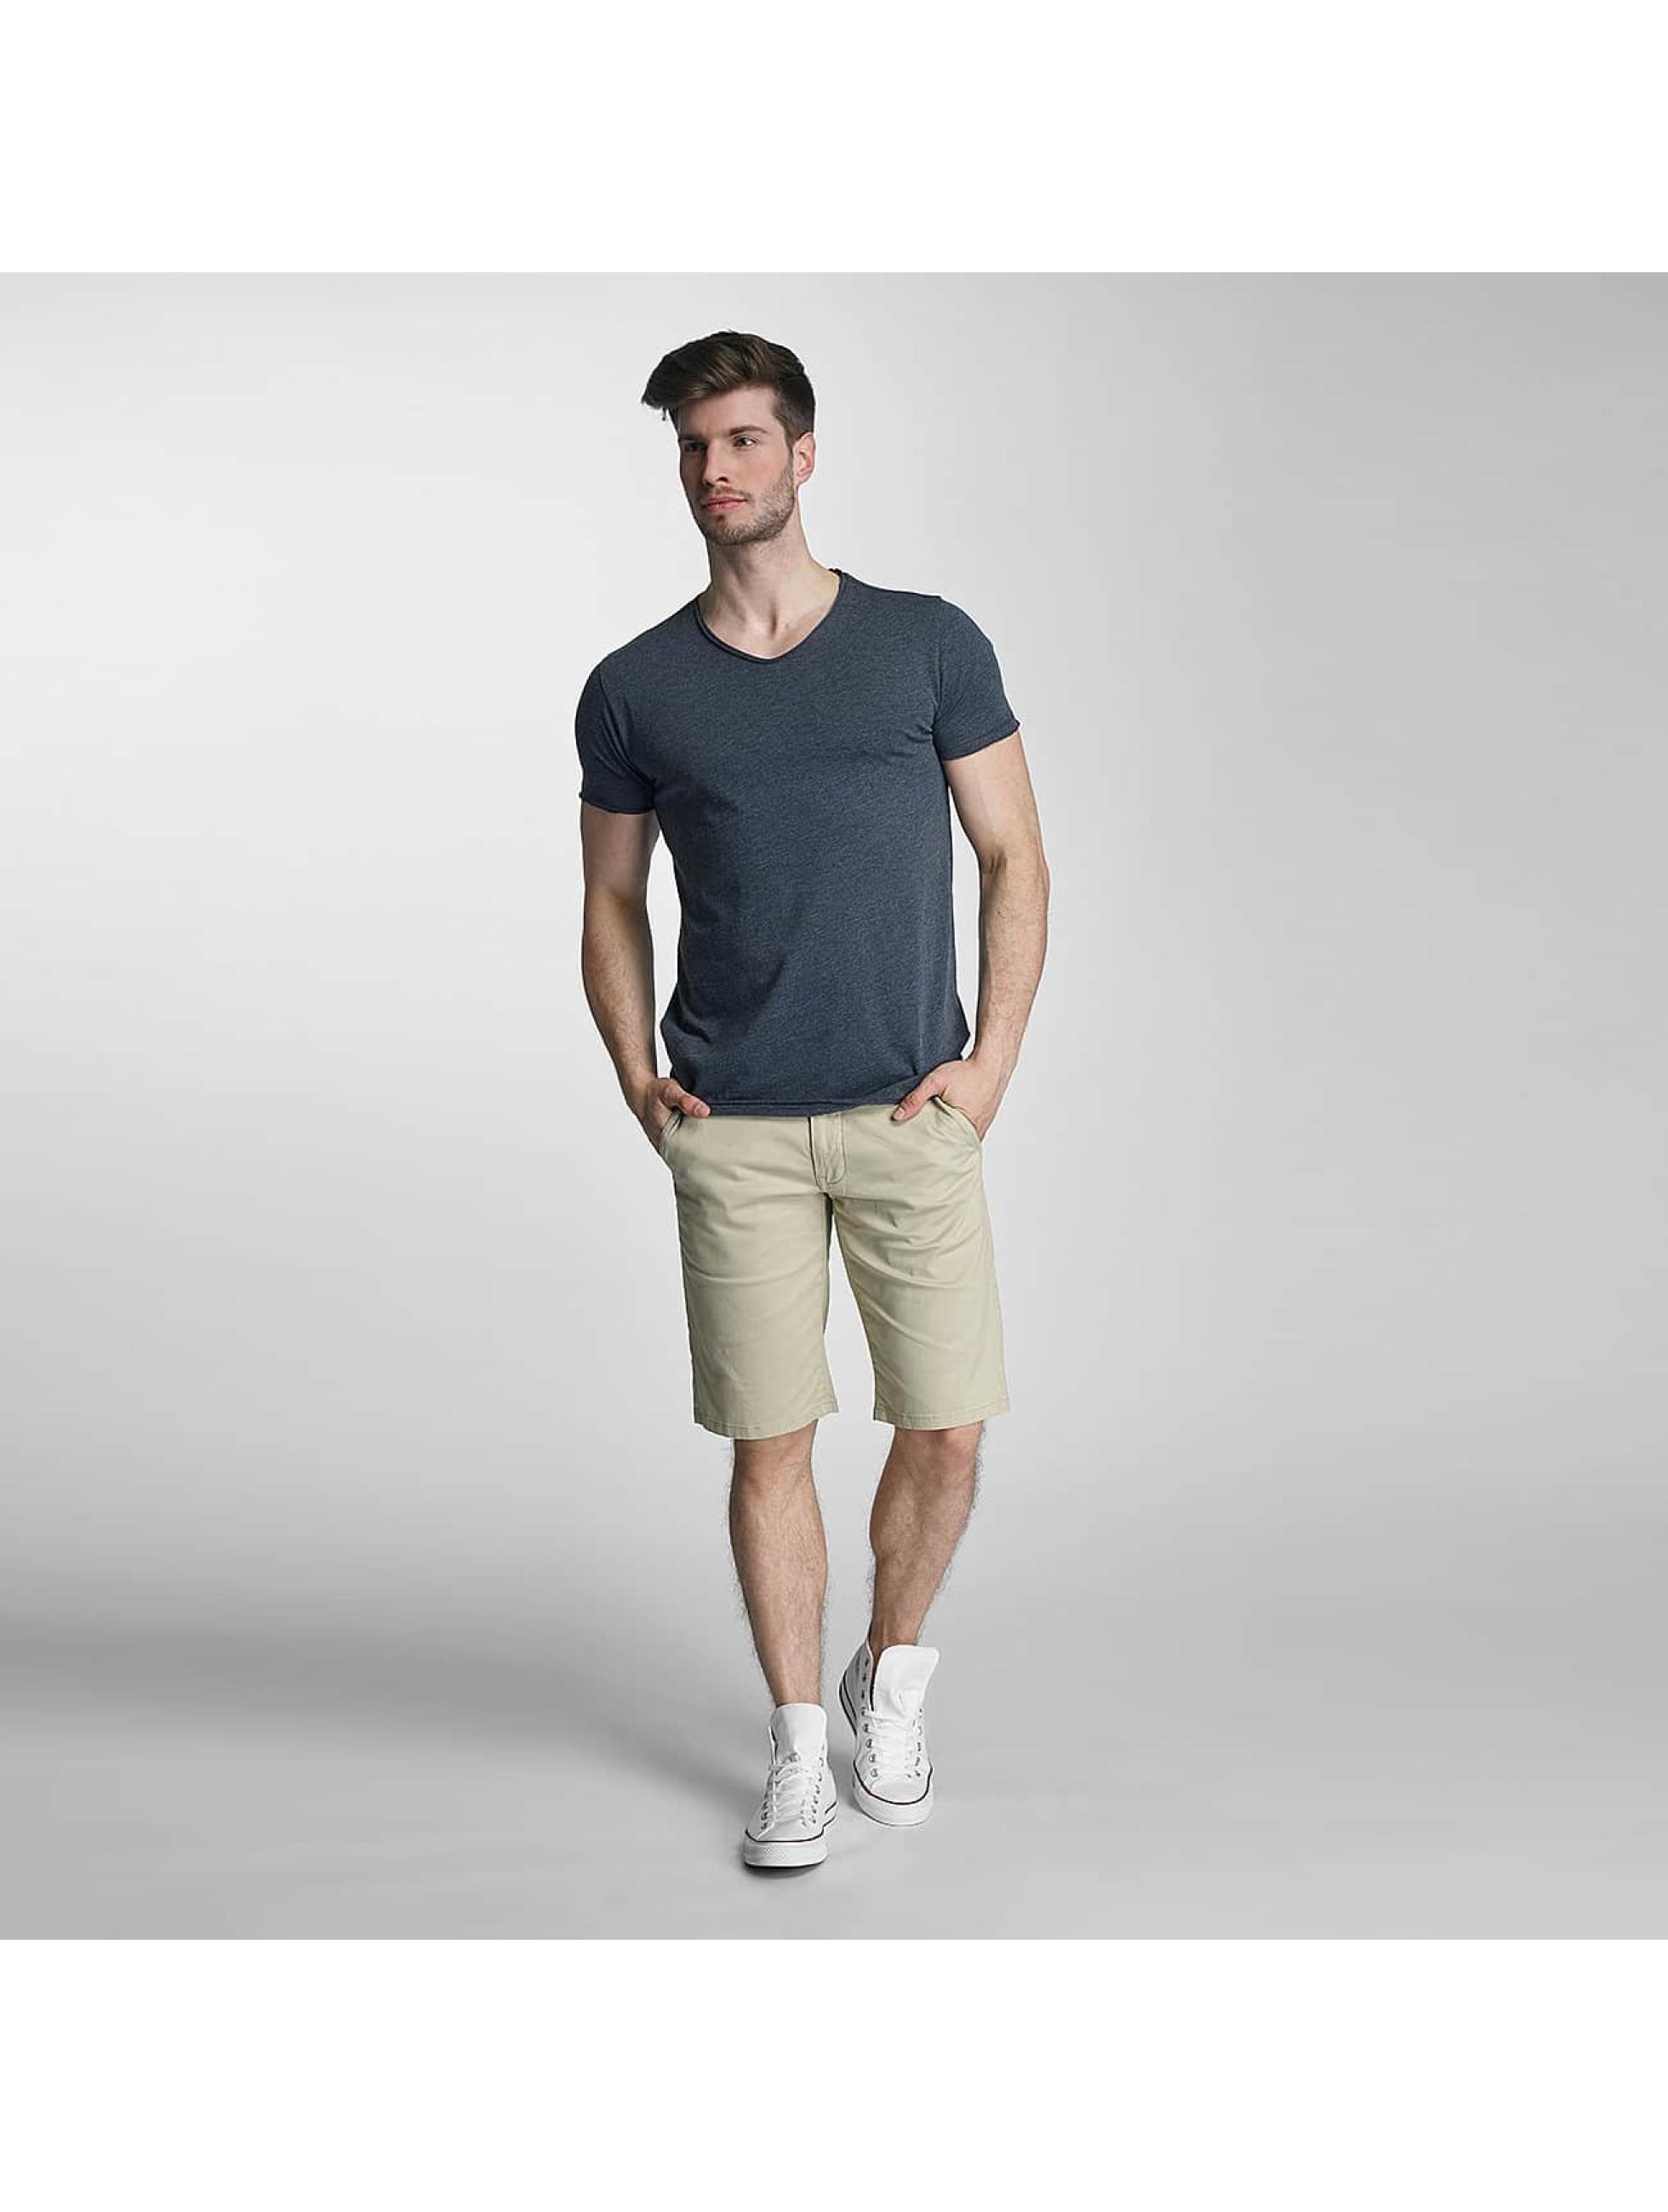 SHINE Original t-shirt Mélange blauw